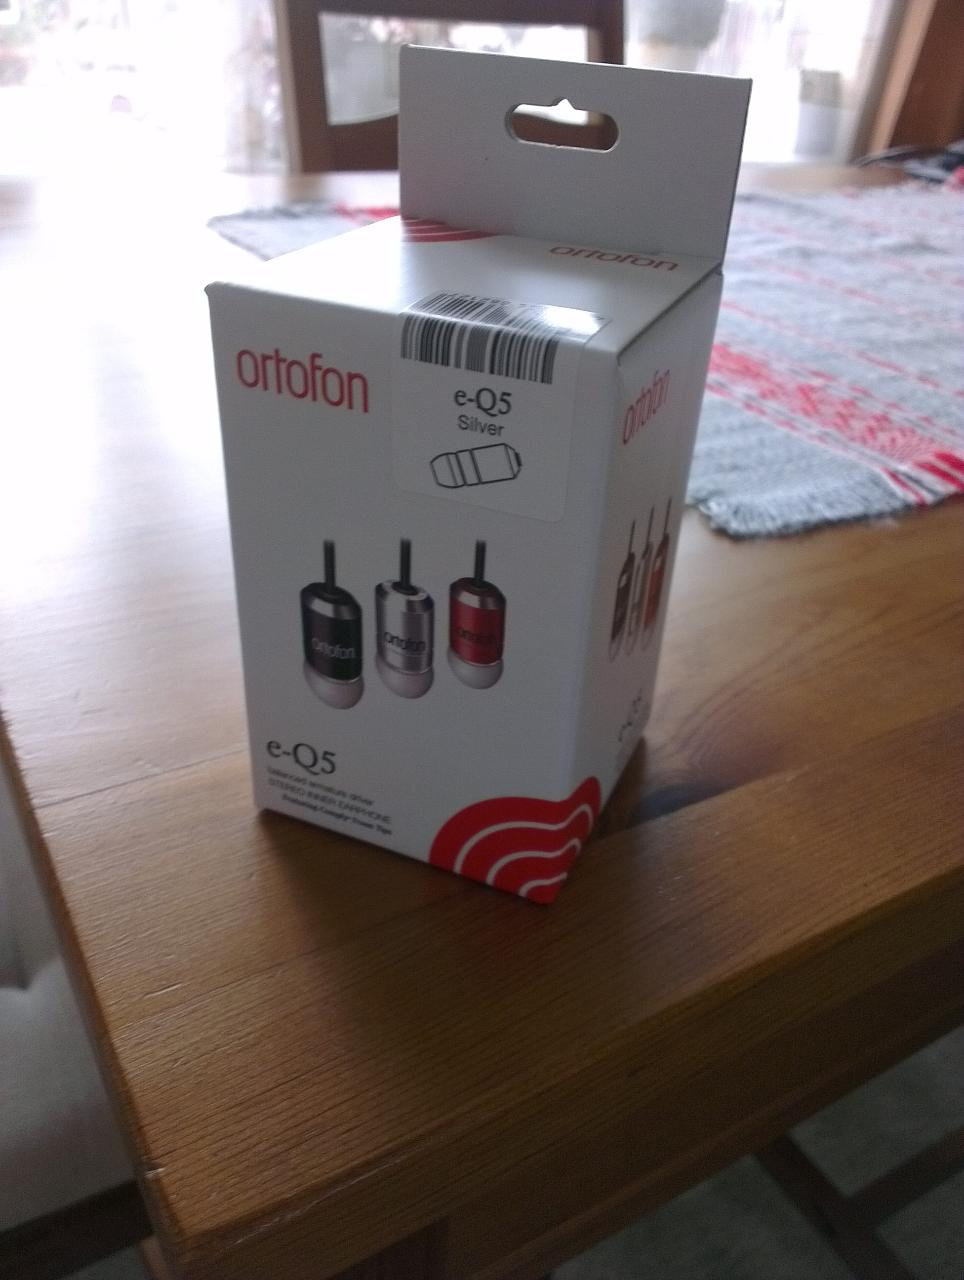 Expensive tiny box...